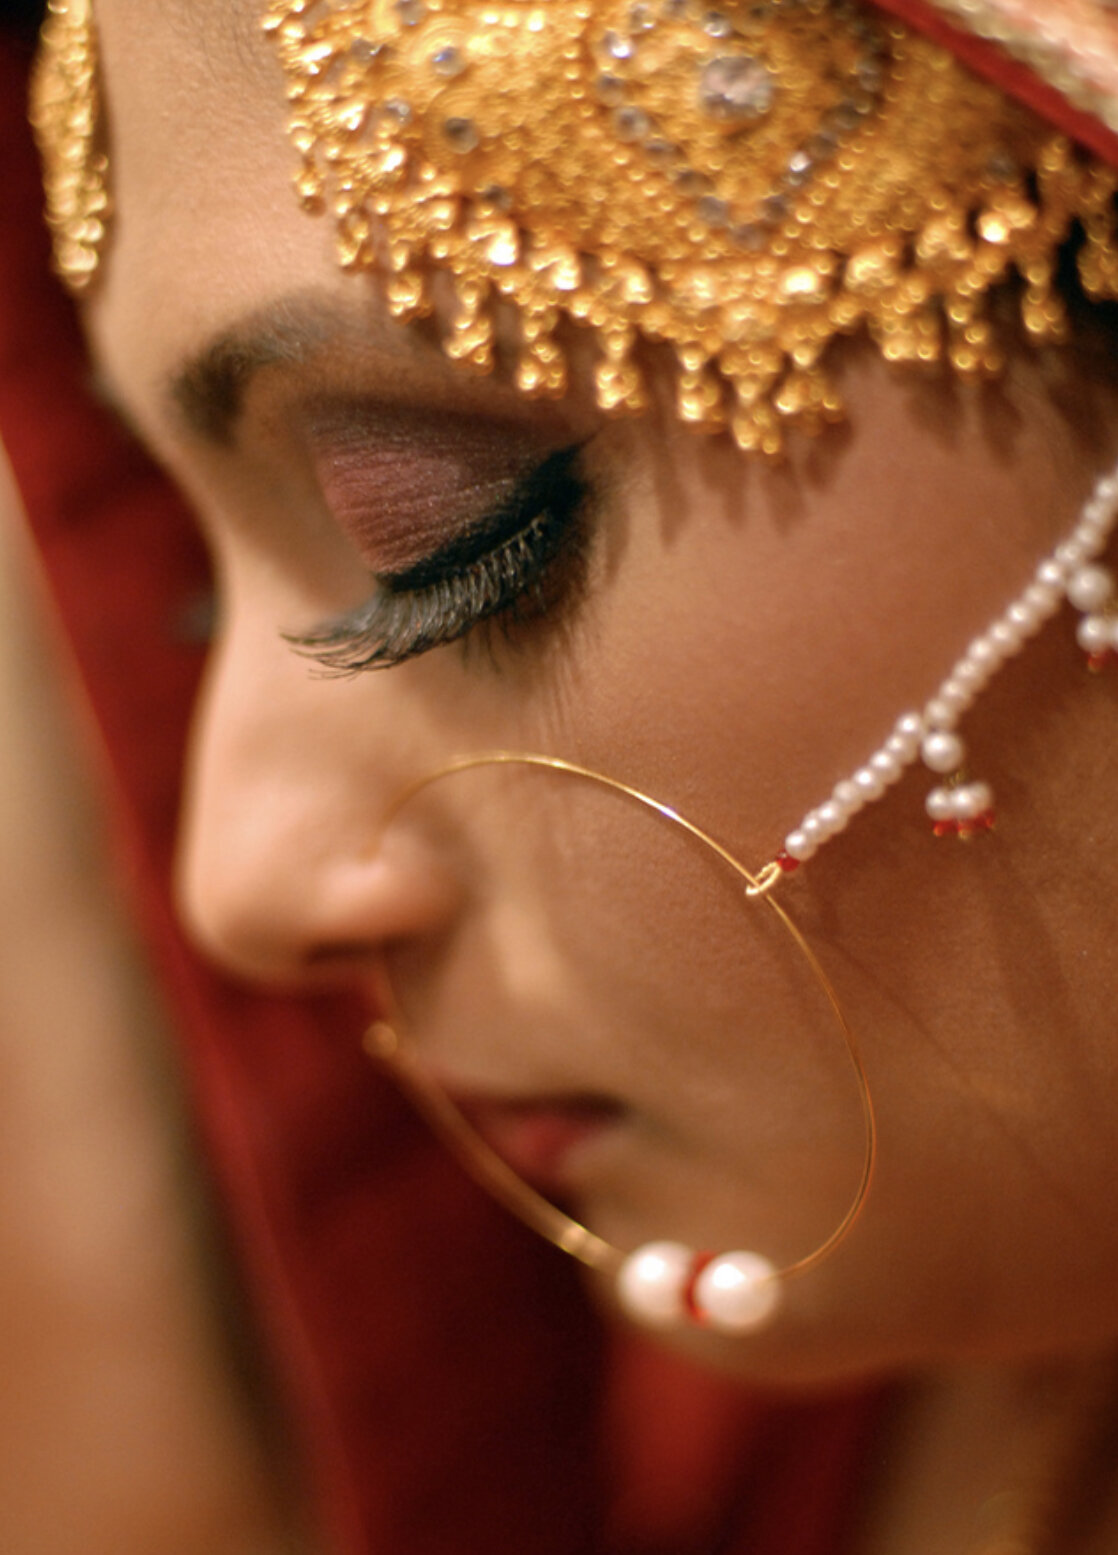 Pakistani wedding, ca. 2010